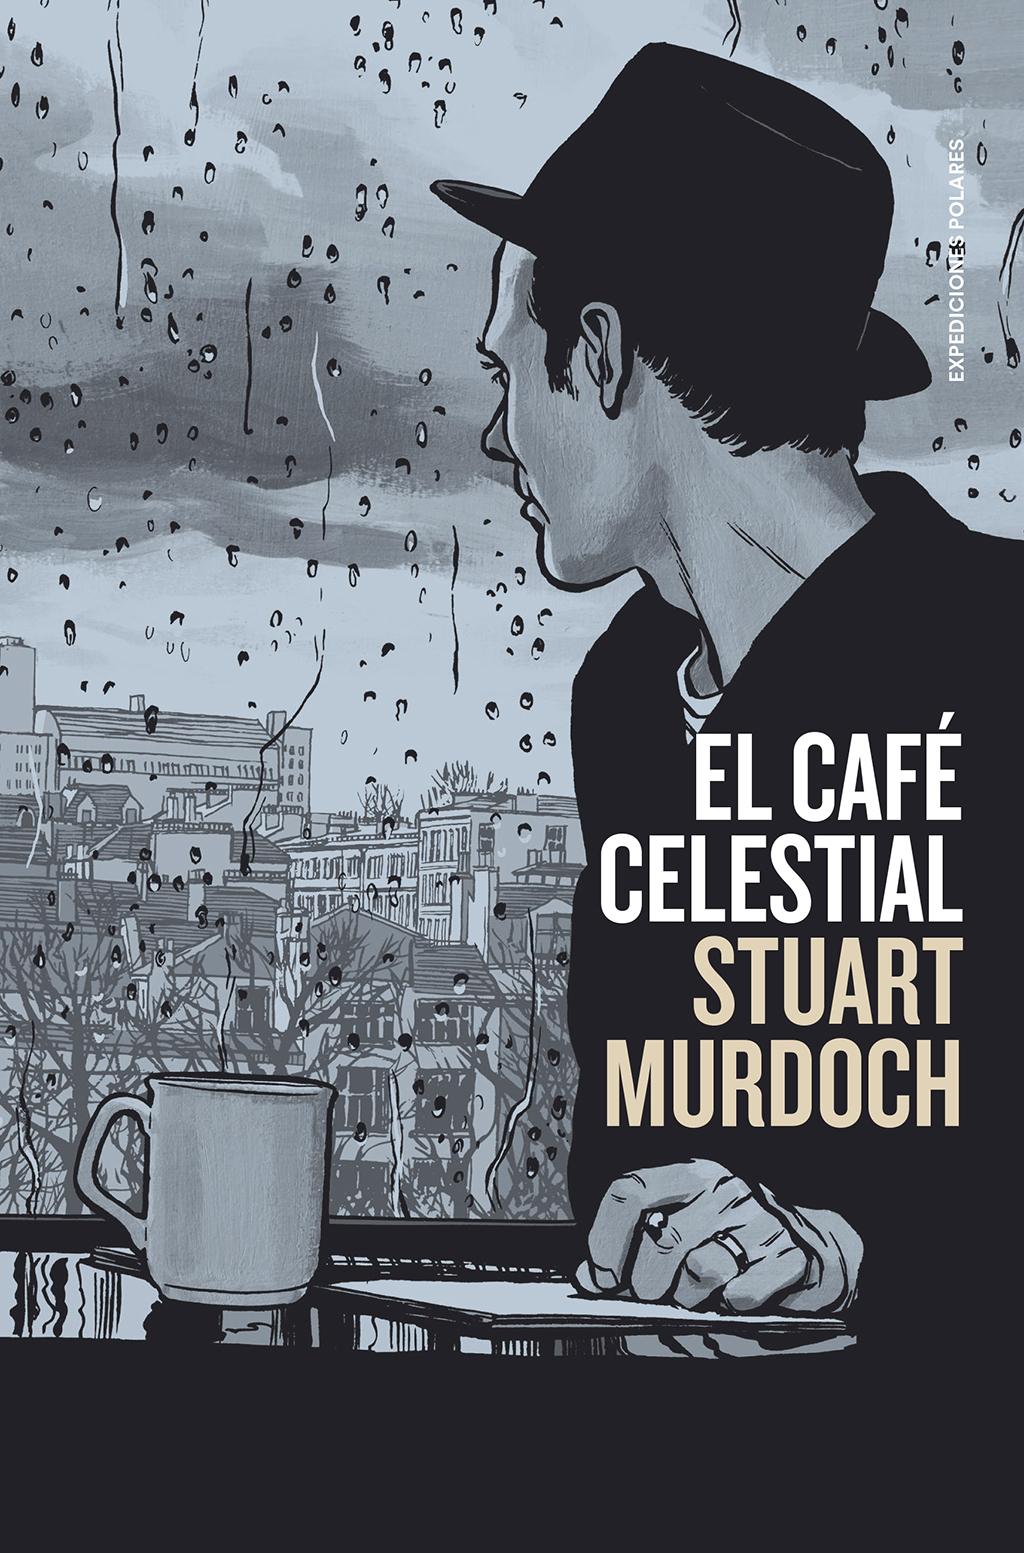 El café celestial.lecoolvalencia